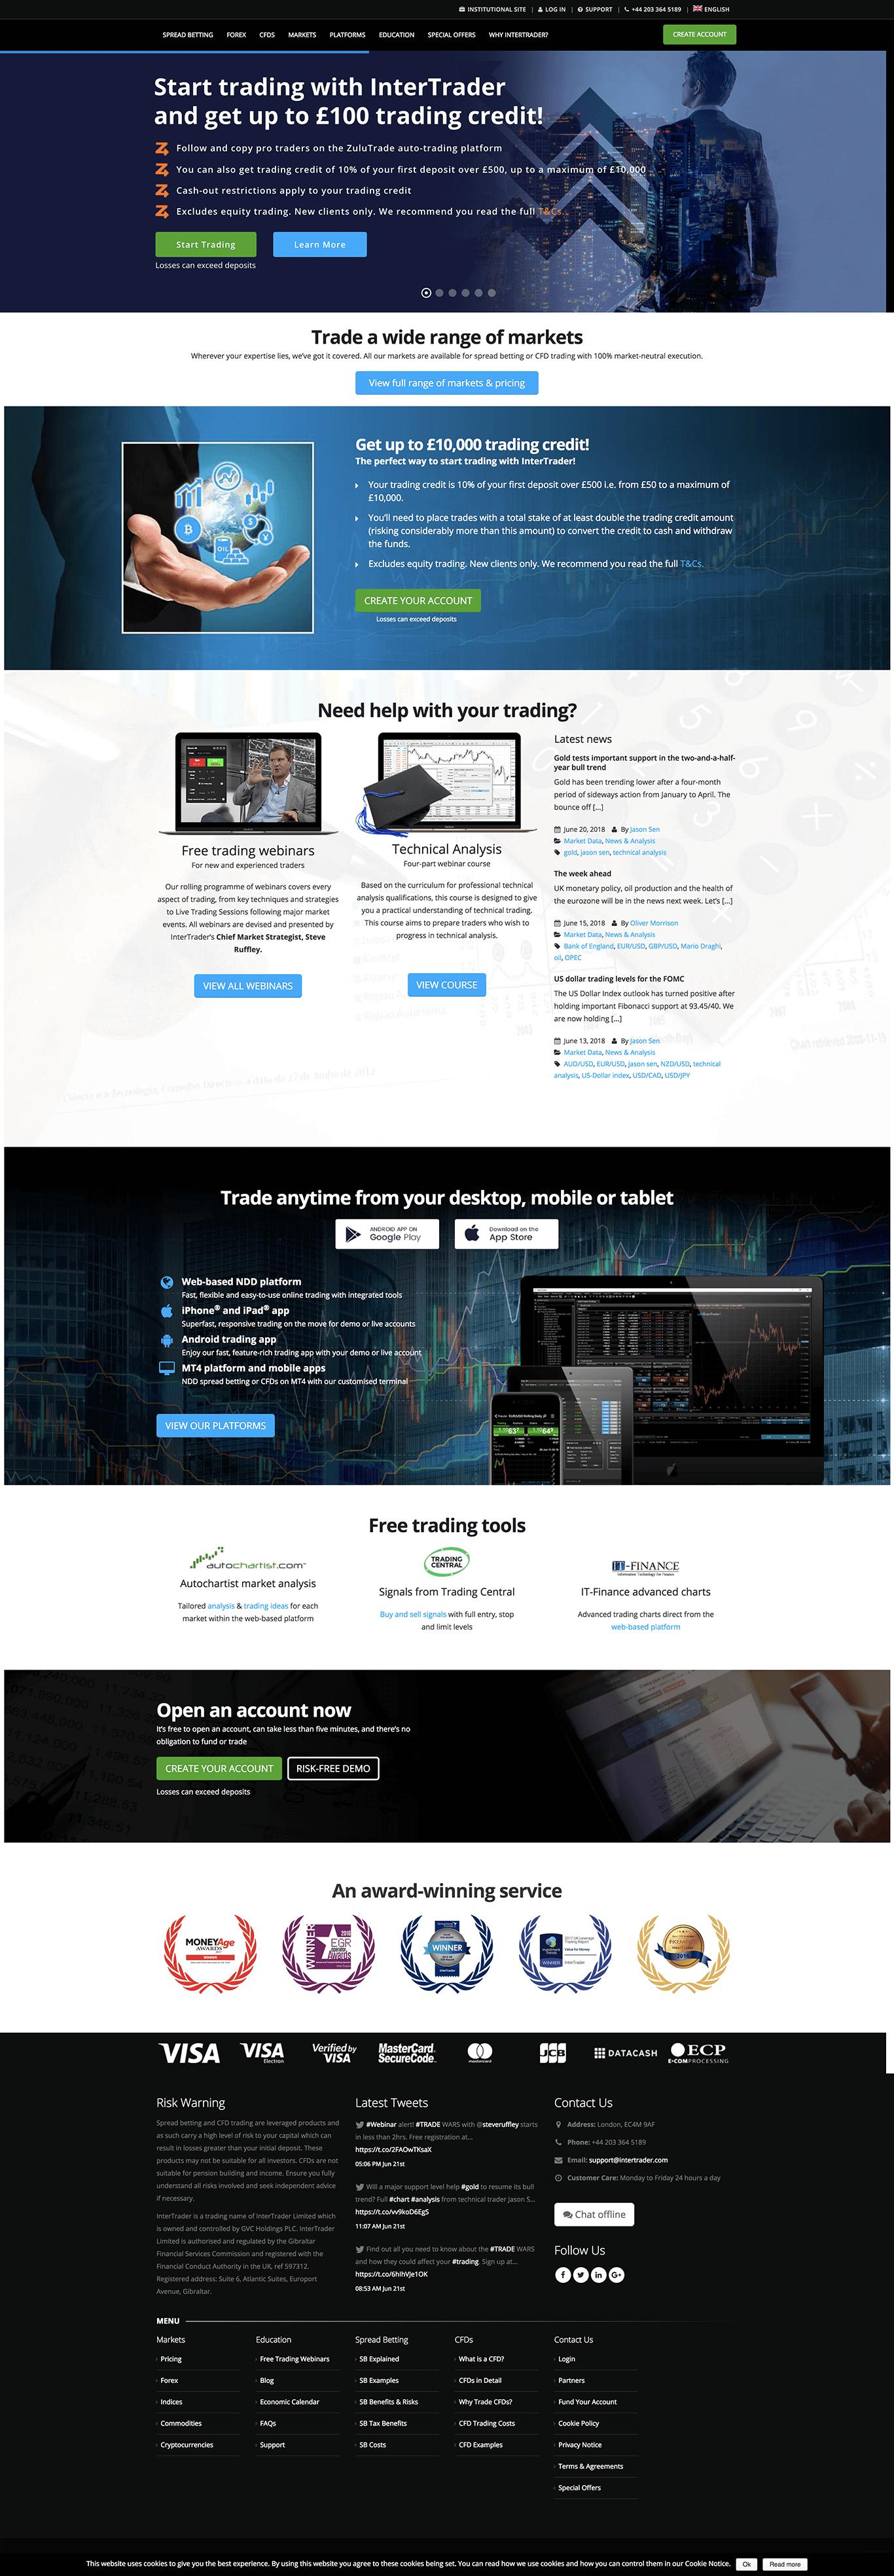 Intertrader spread betting best website to bet on nfl